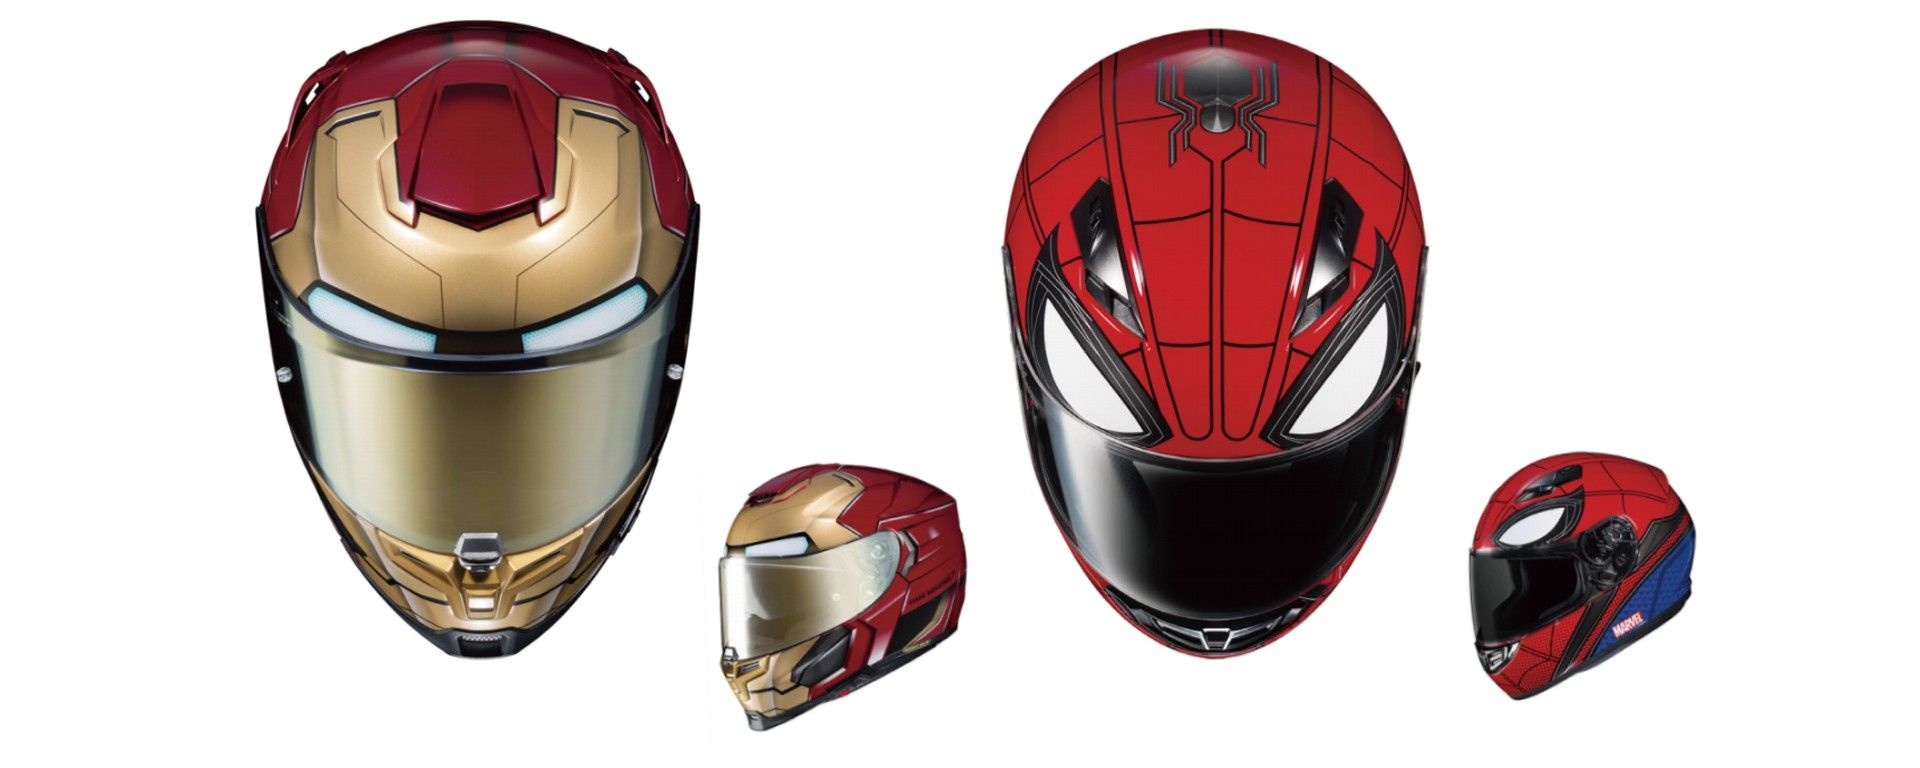 HJC e Marvel: arrivano i nuovi caschi ispirati ai Spider-Man e IronMan